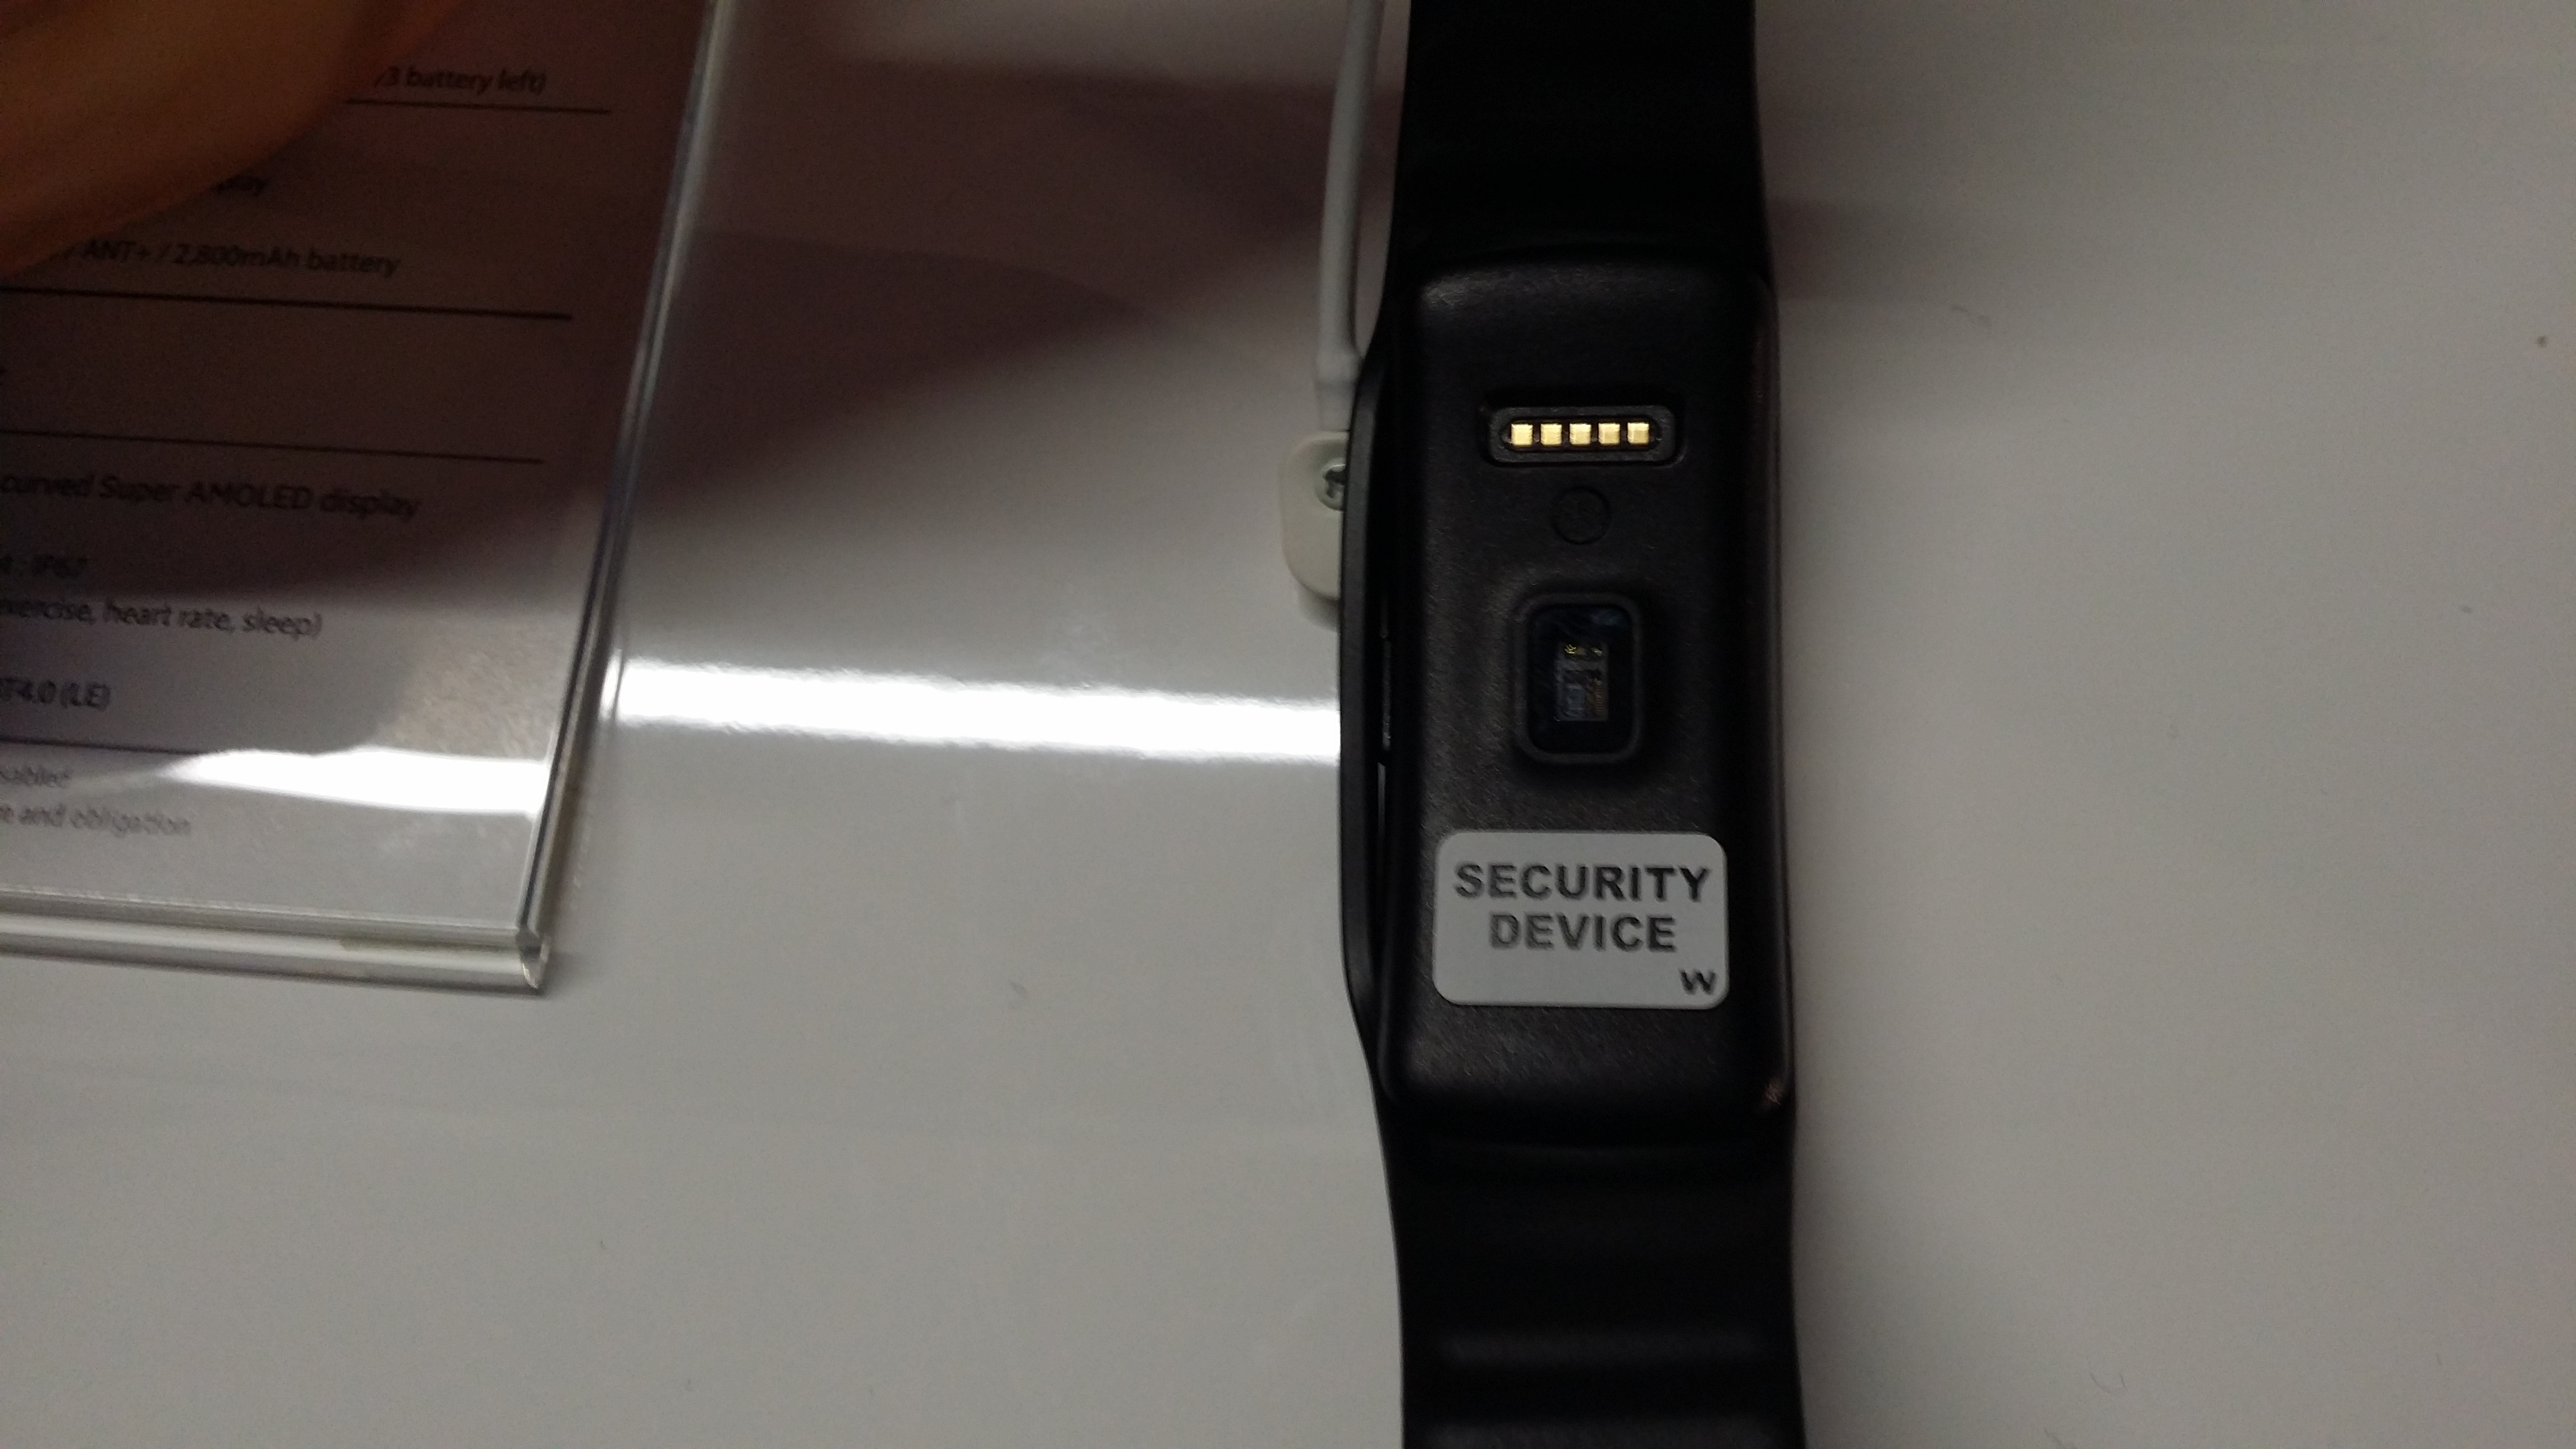 Gear_Fit sensor